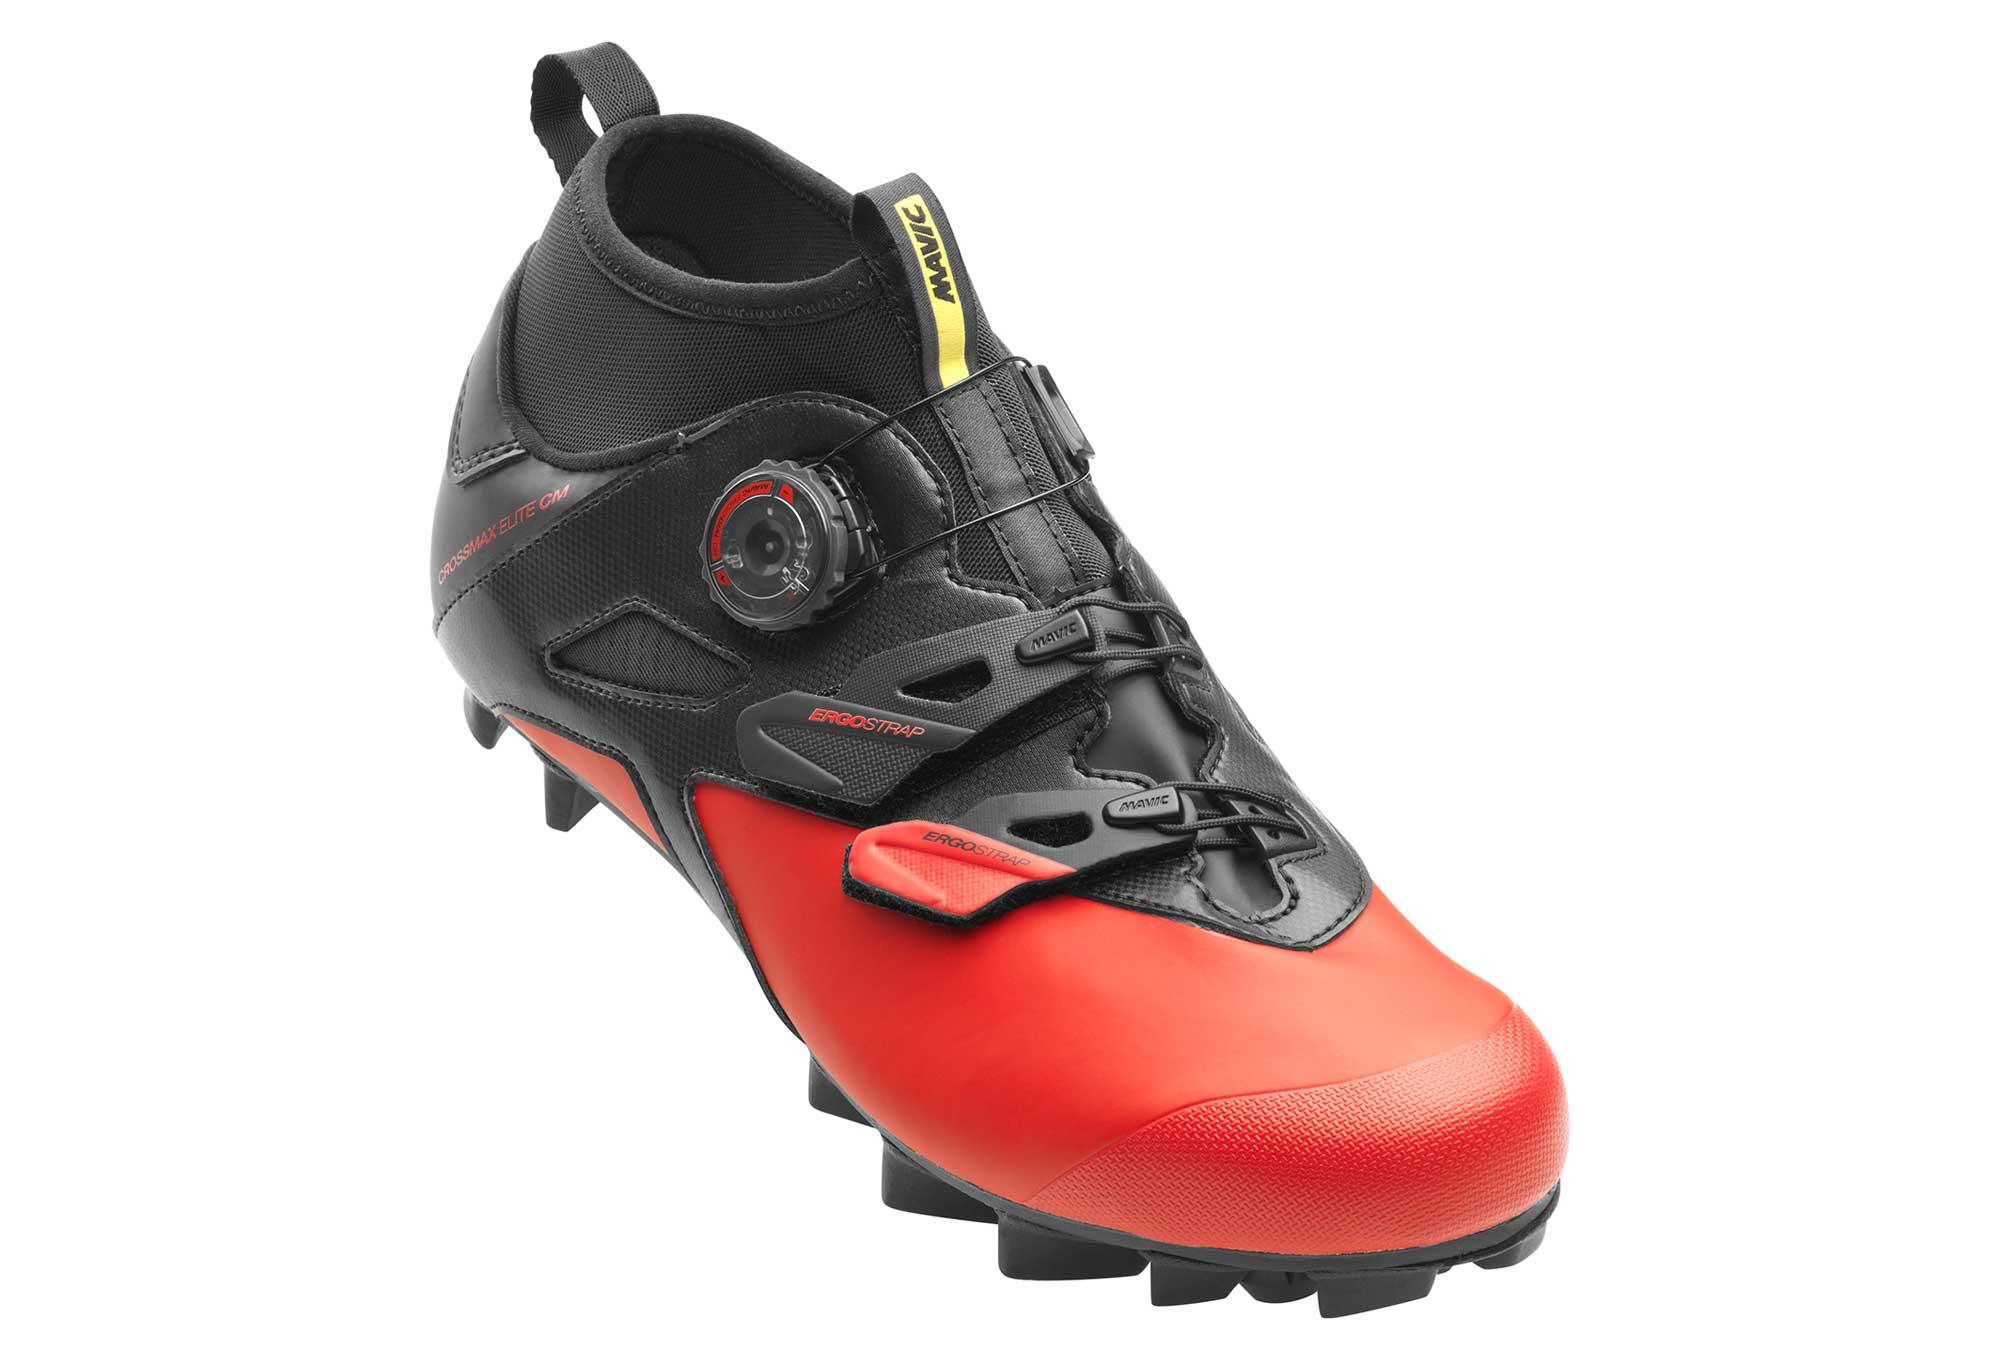 Mtb Mavic Cosmic Cm Elite Zapatillas Vision Rojo Negro CsQxthrd